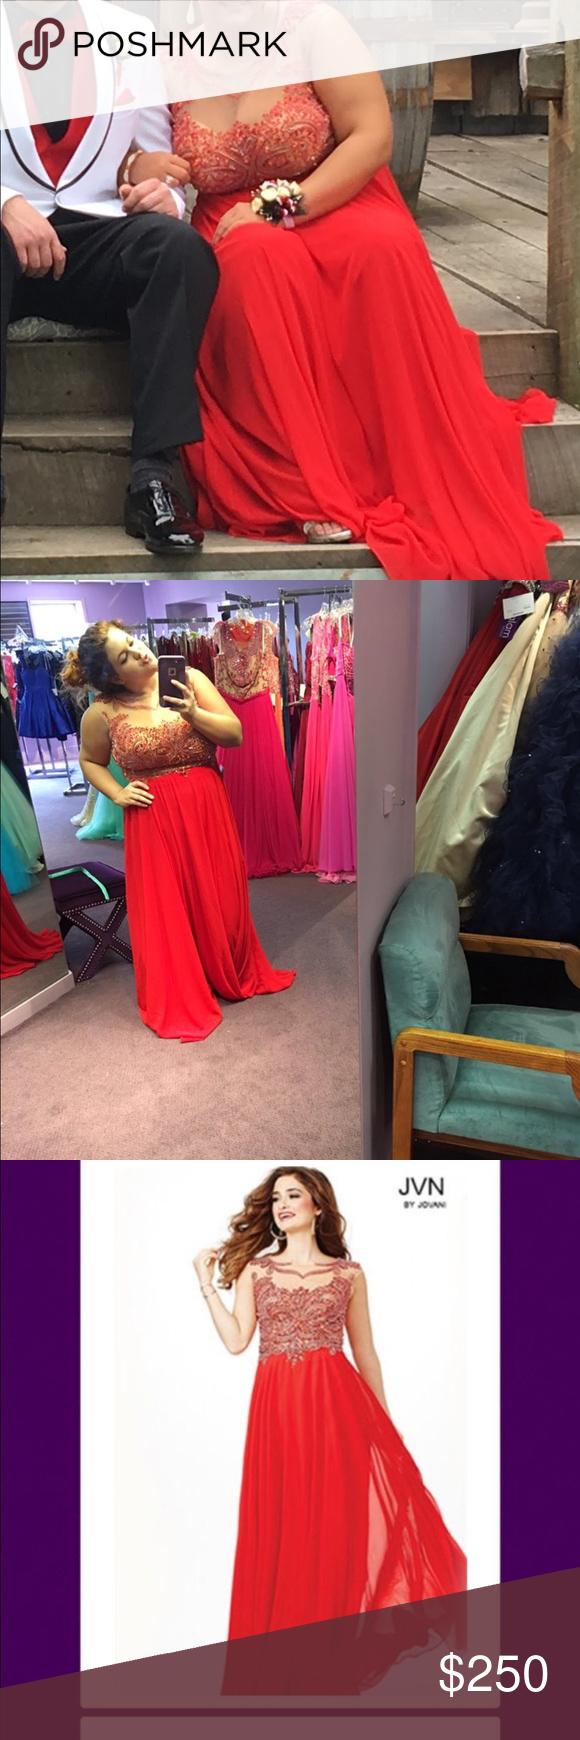 Selling my prom dress   Prom, Jewel and Dress prom